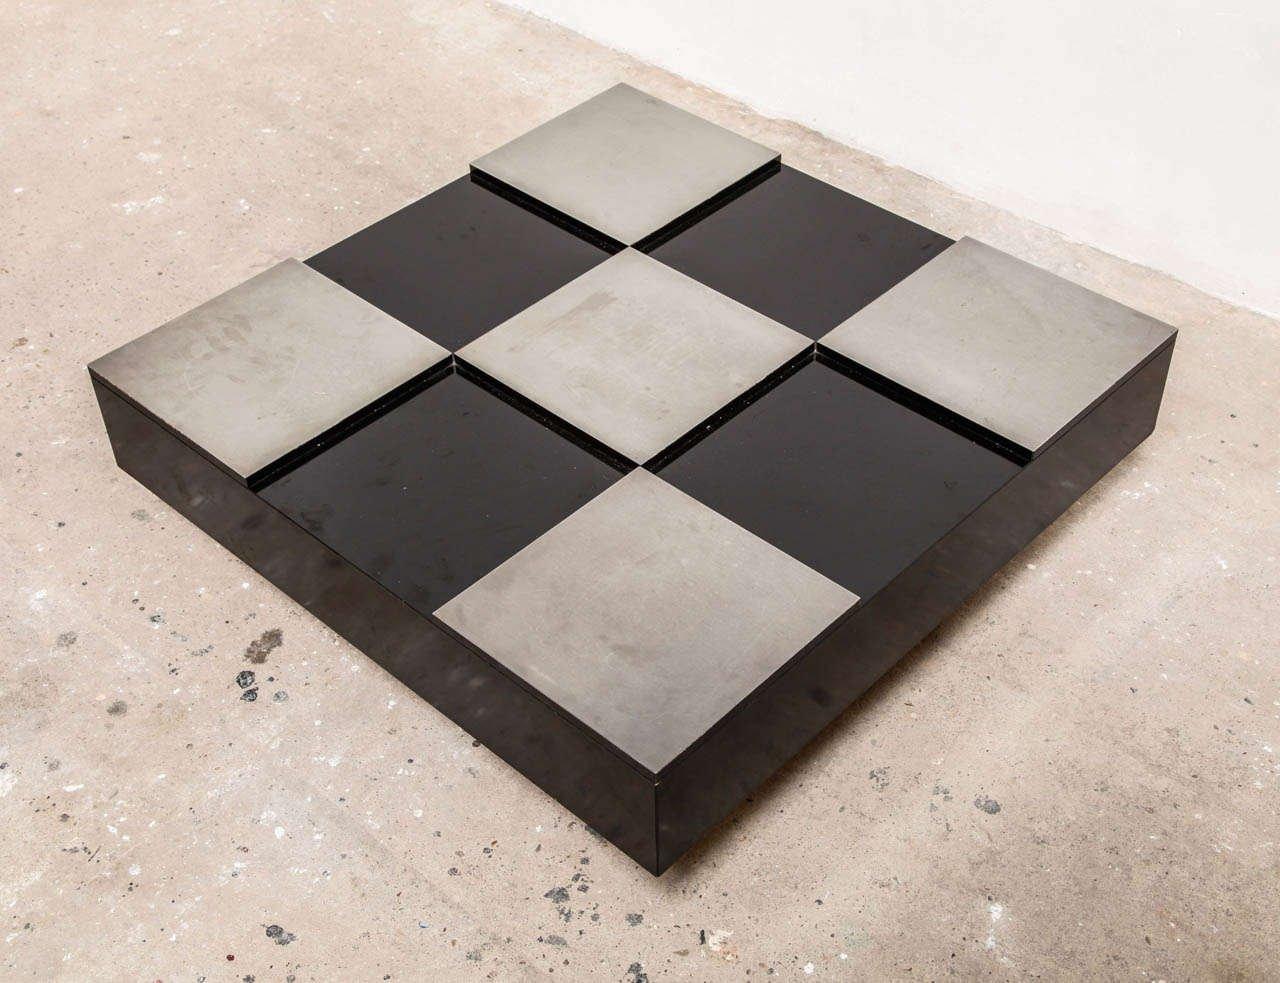 italienischer sperrholz aluminium couchtisch 1969 bei. Black Bedroom Furniture Sets. Home Design Ideas